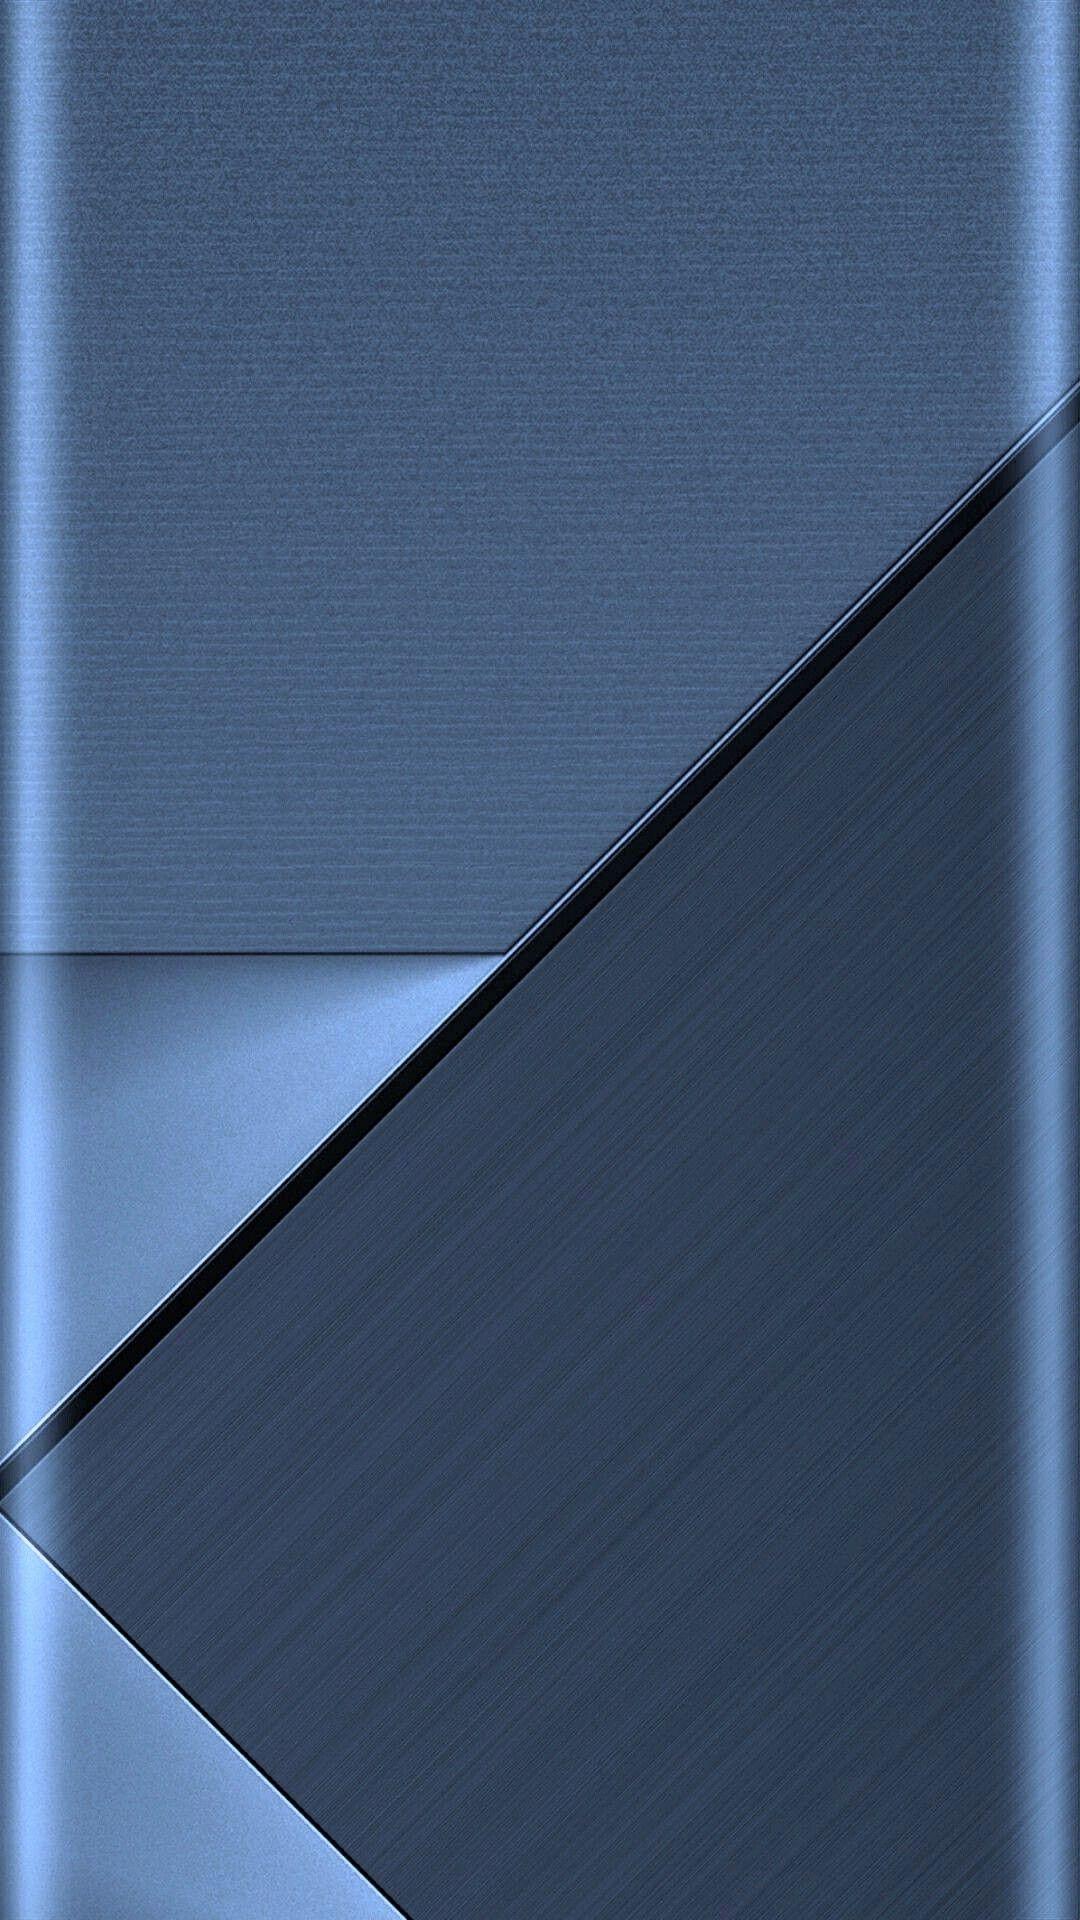 Unduh 53 Koleksi Wallpaper Hd Edge Gambar Paling Keren Wallpaper Ponsel Abstrak Gambar